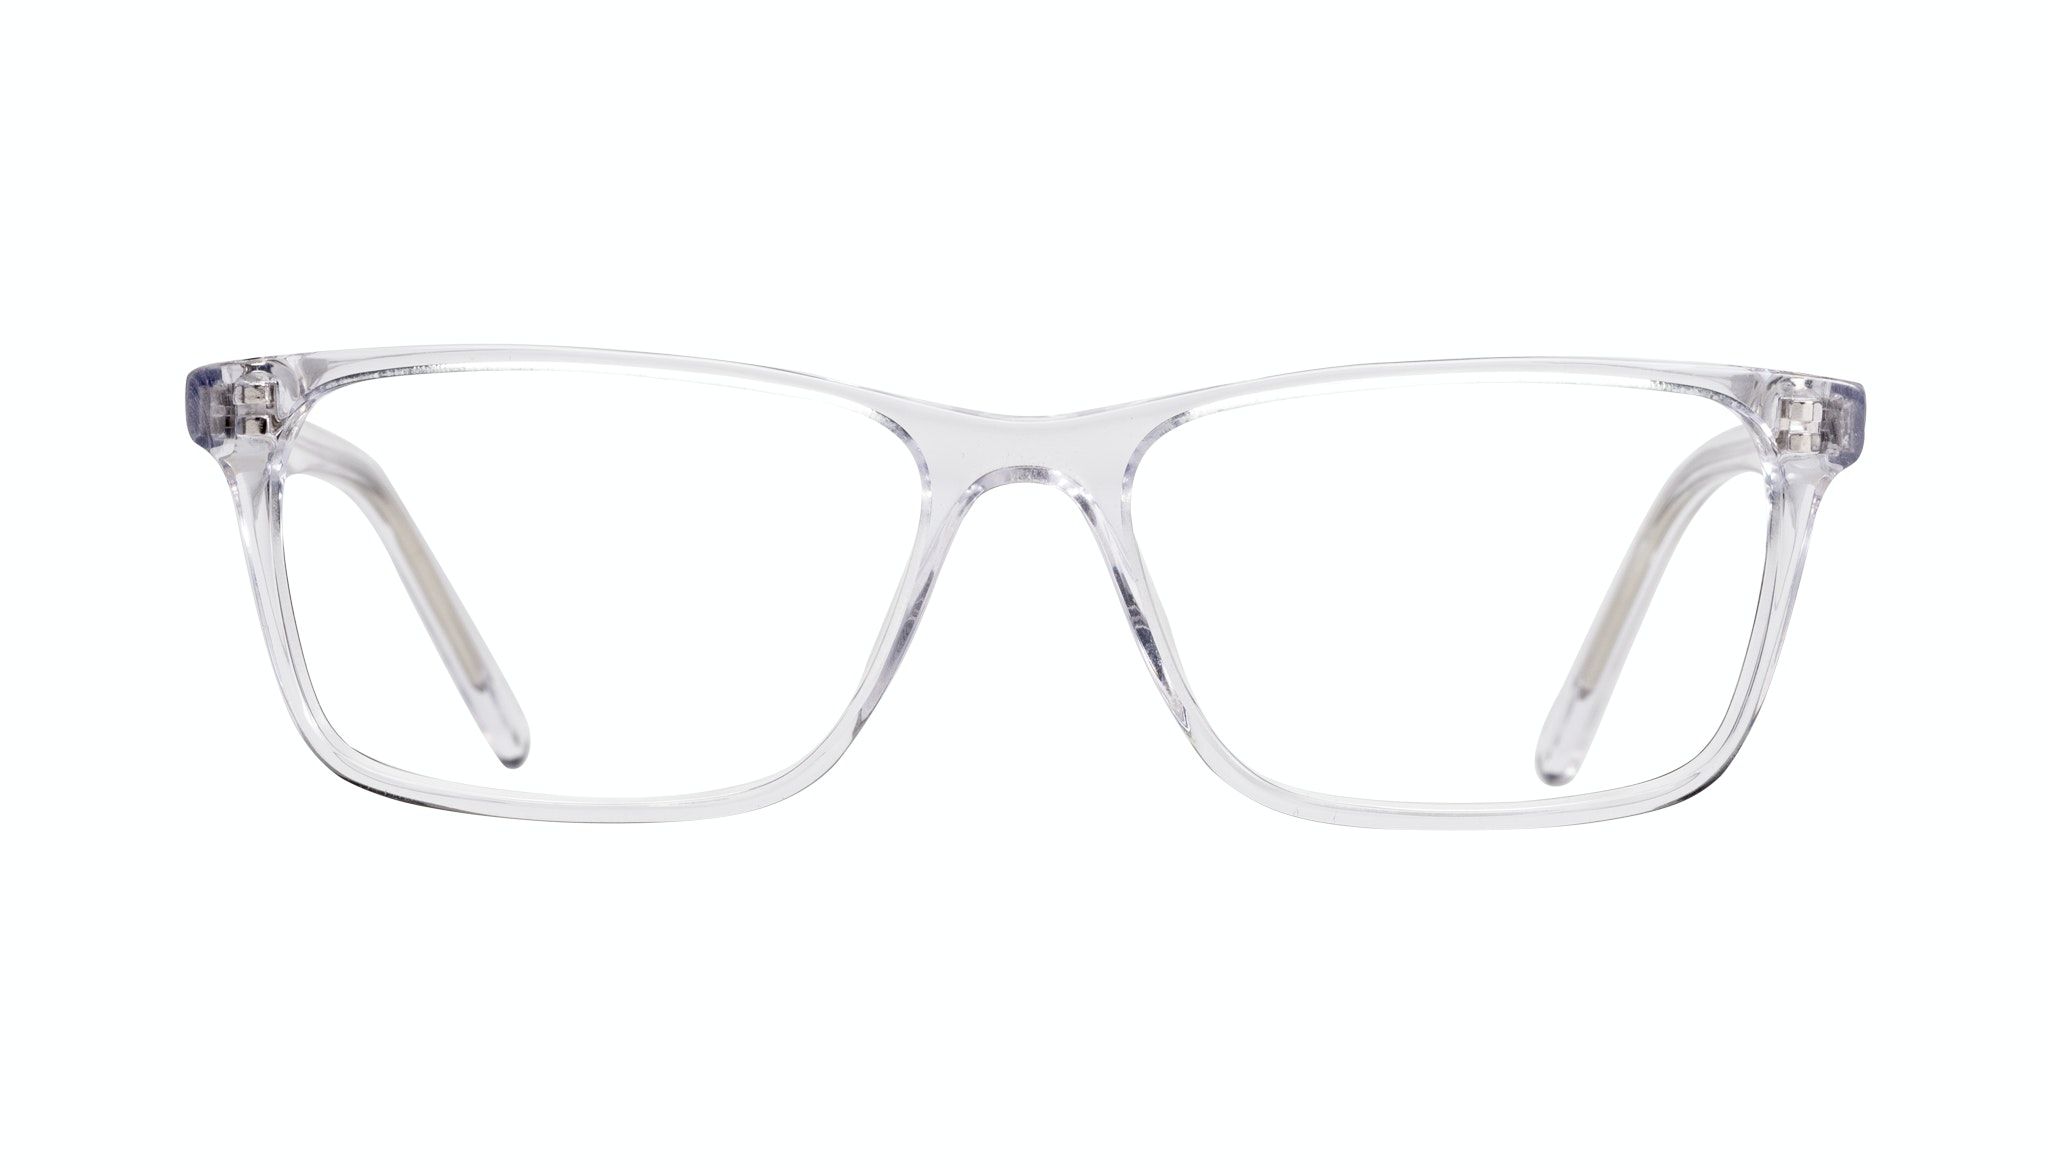 Affordable Fashion Glasses Rectangle Eyeglasses Men Henri Clear